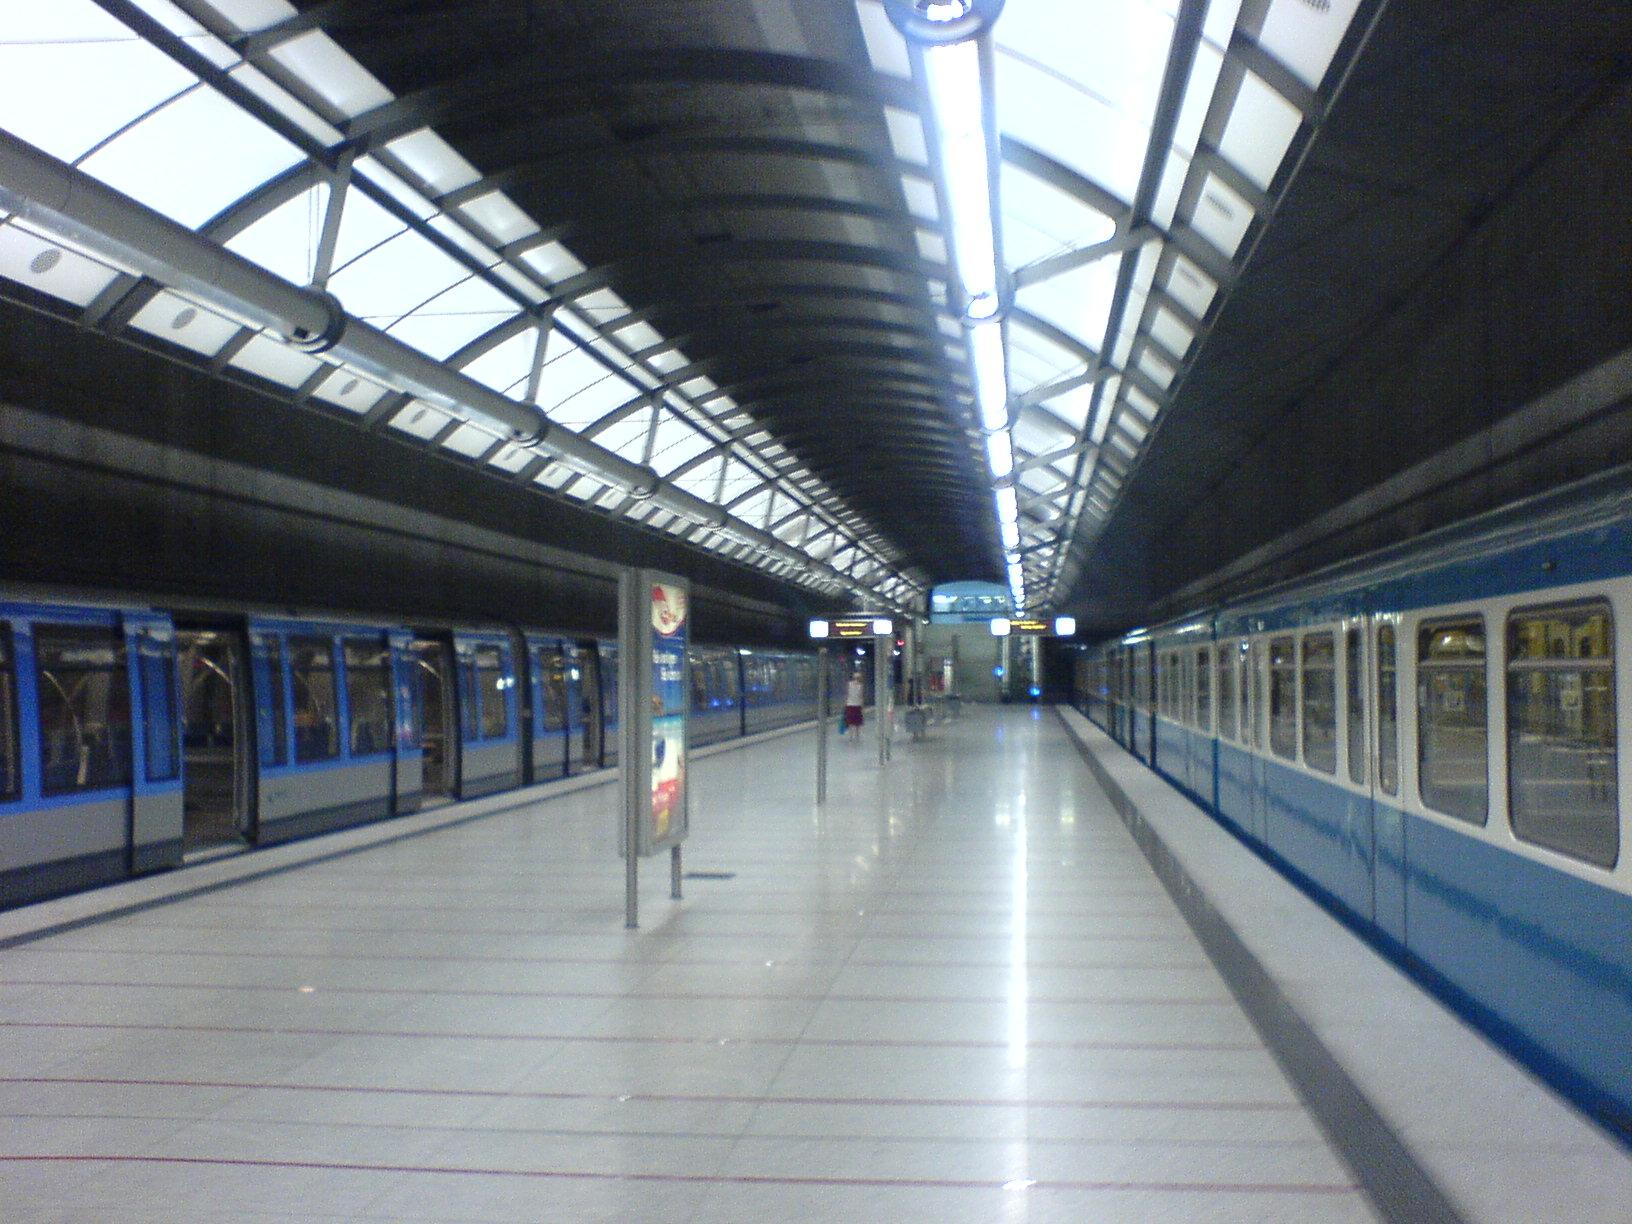 U Bahnhof Messestadt Ost Wikipedia